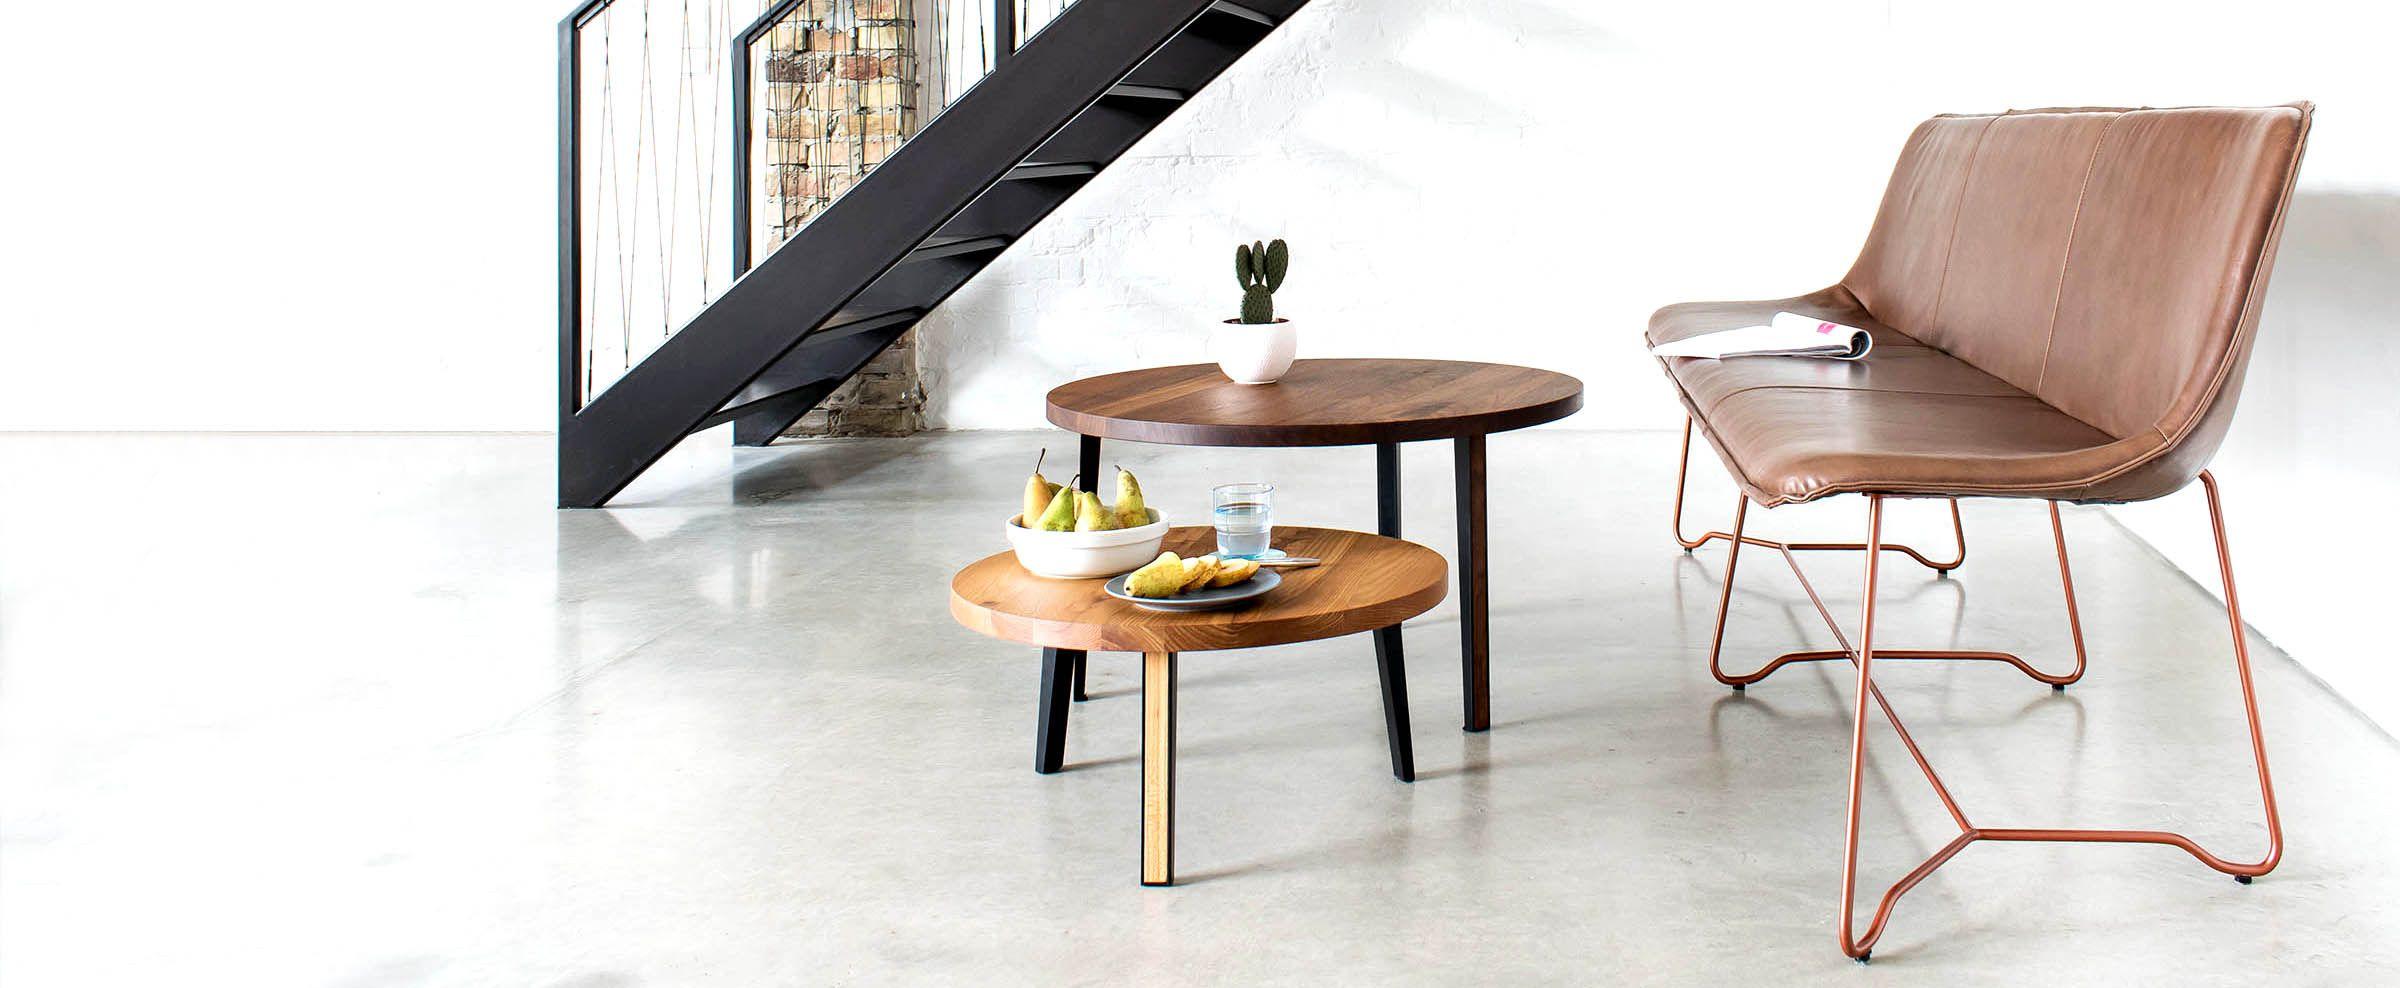 Lederbank Like Mbzwo Sitzbänke Home Decor Decor Und Design